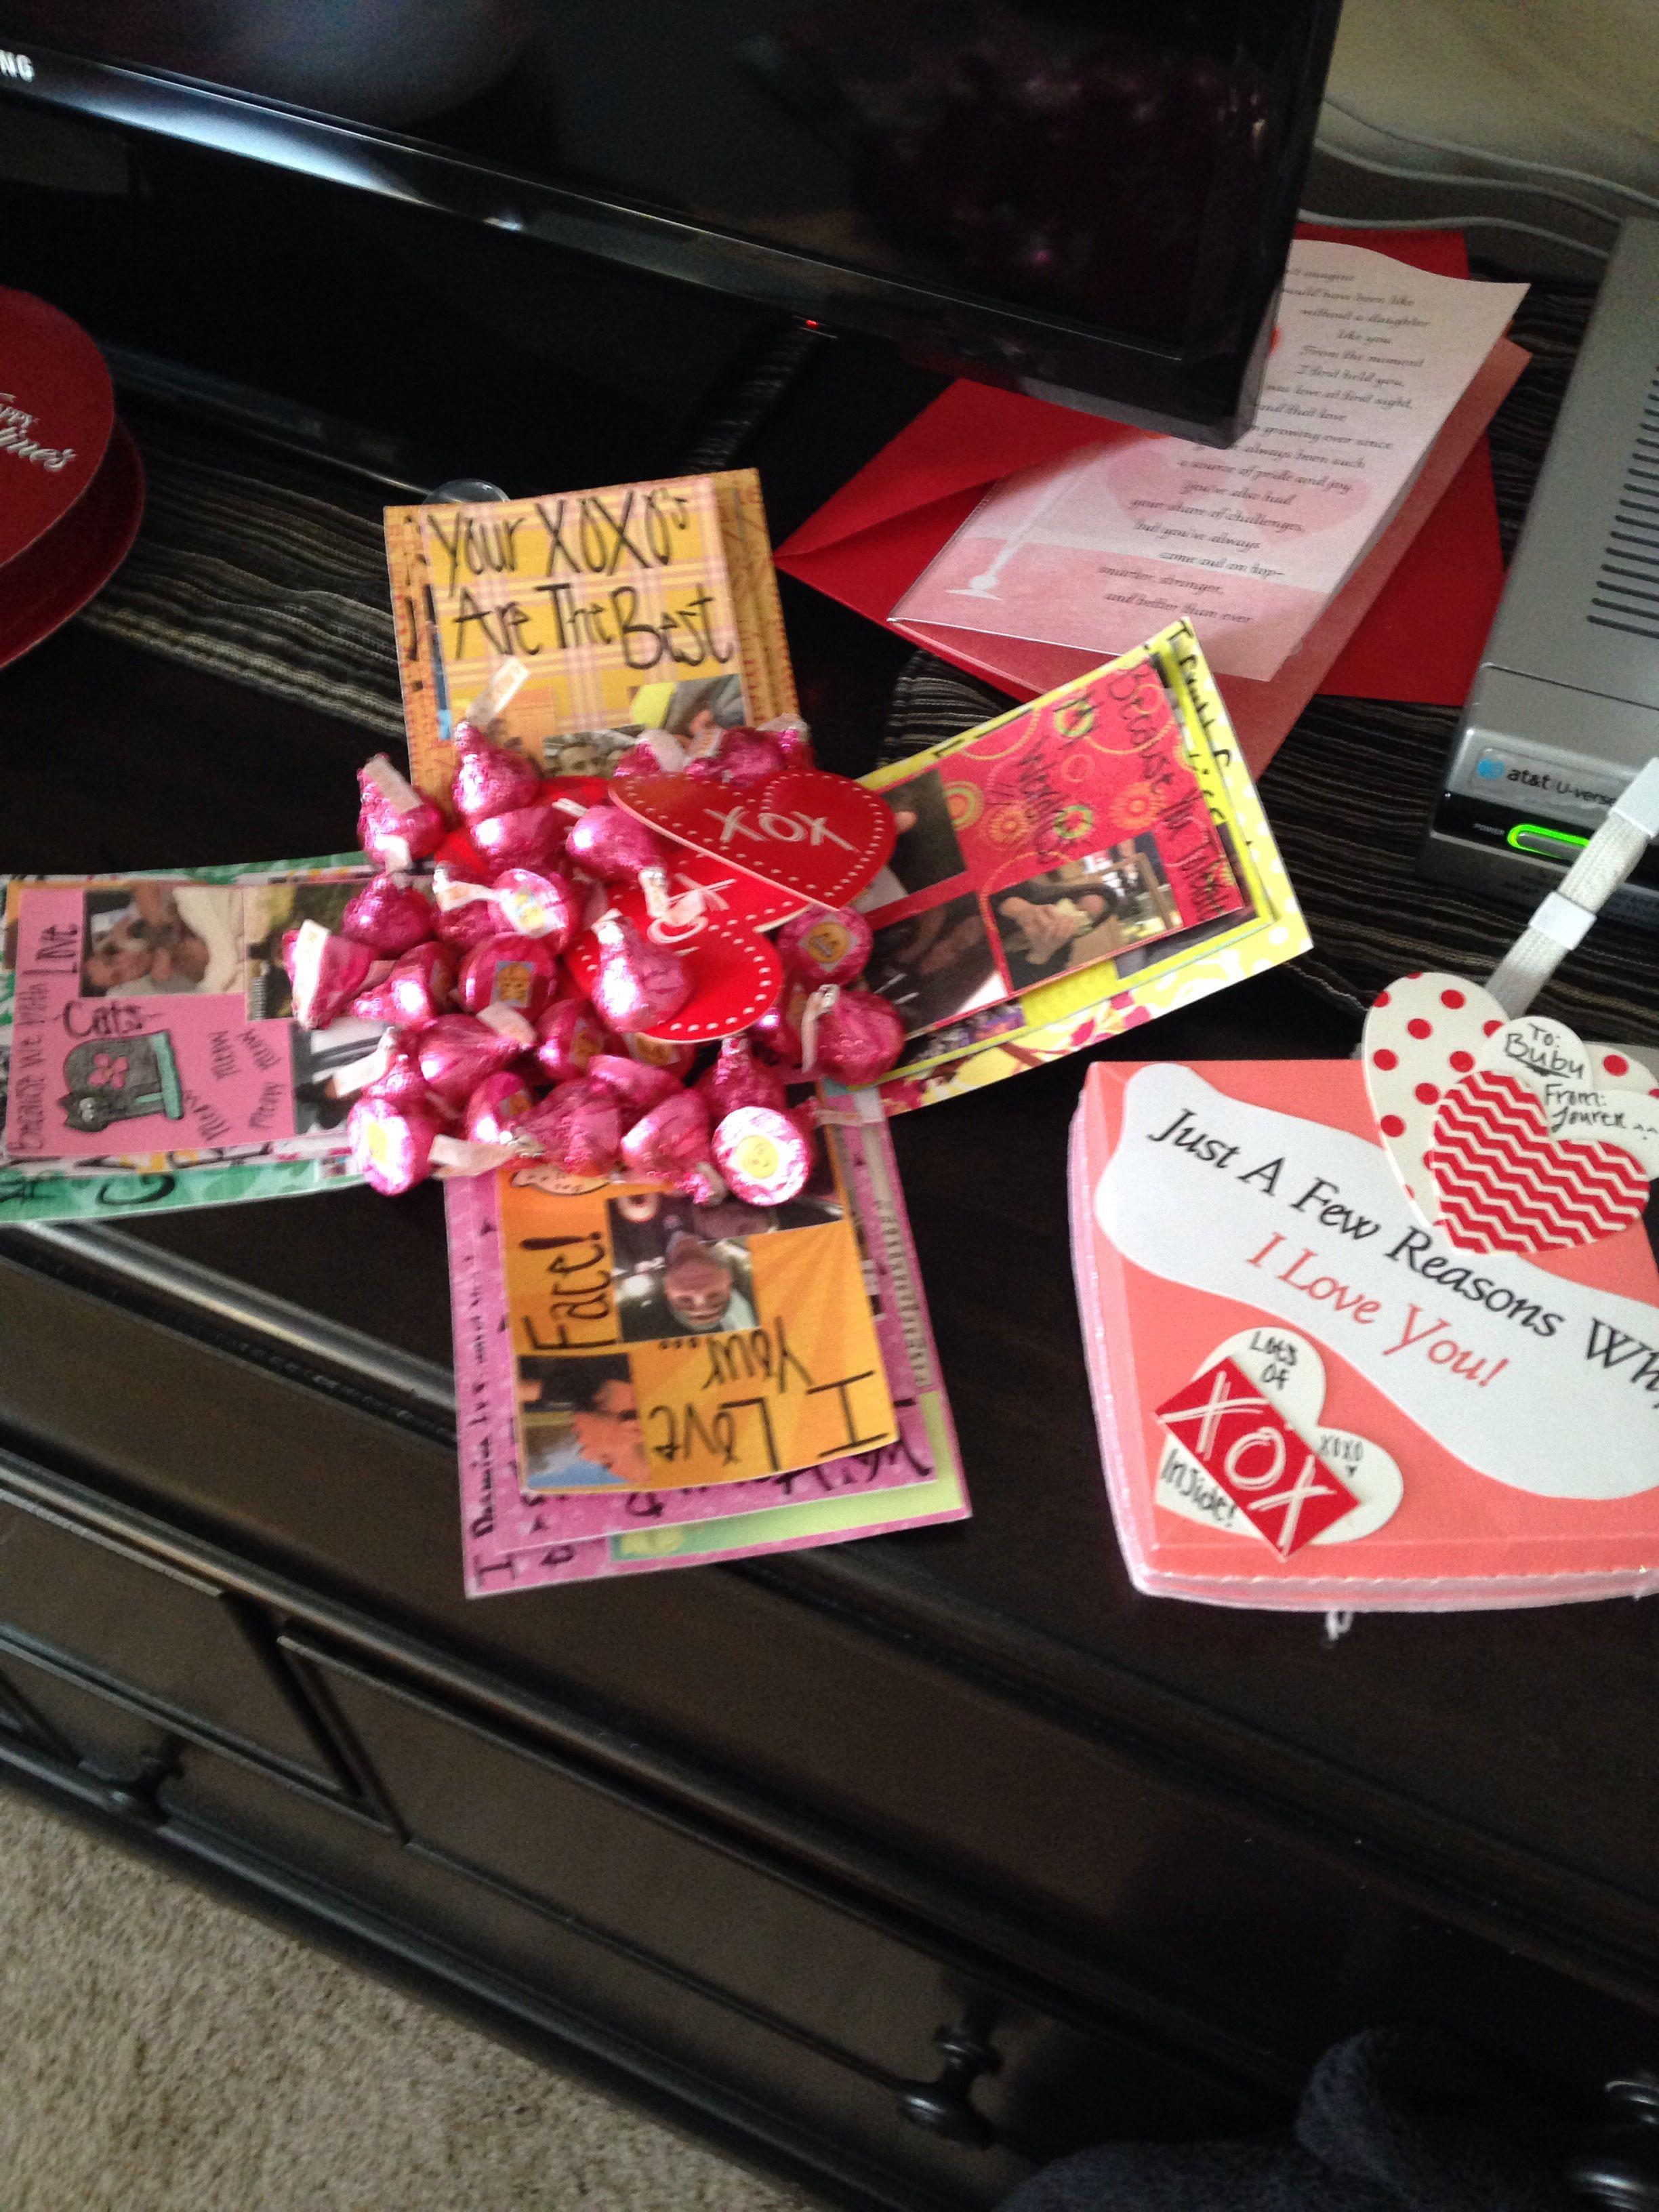 My exploding box I made for my boyfriend on valentines day